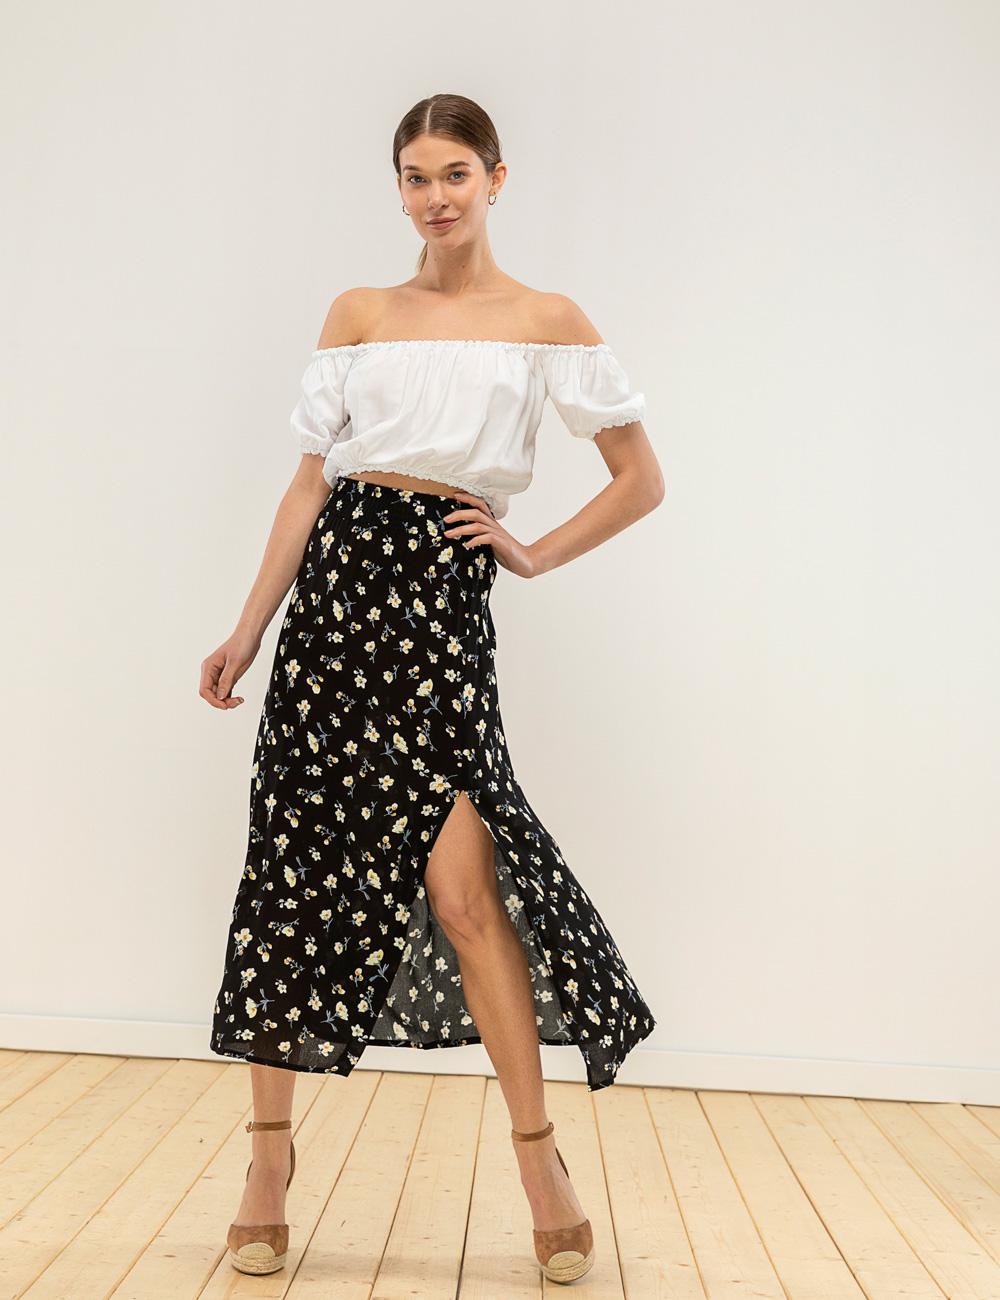 2c21085de95 Φλοράλ φούστα σκίσιμο | Mindyourstyle.gr